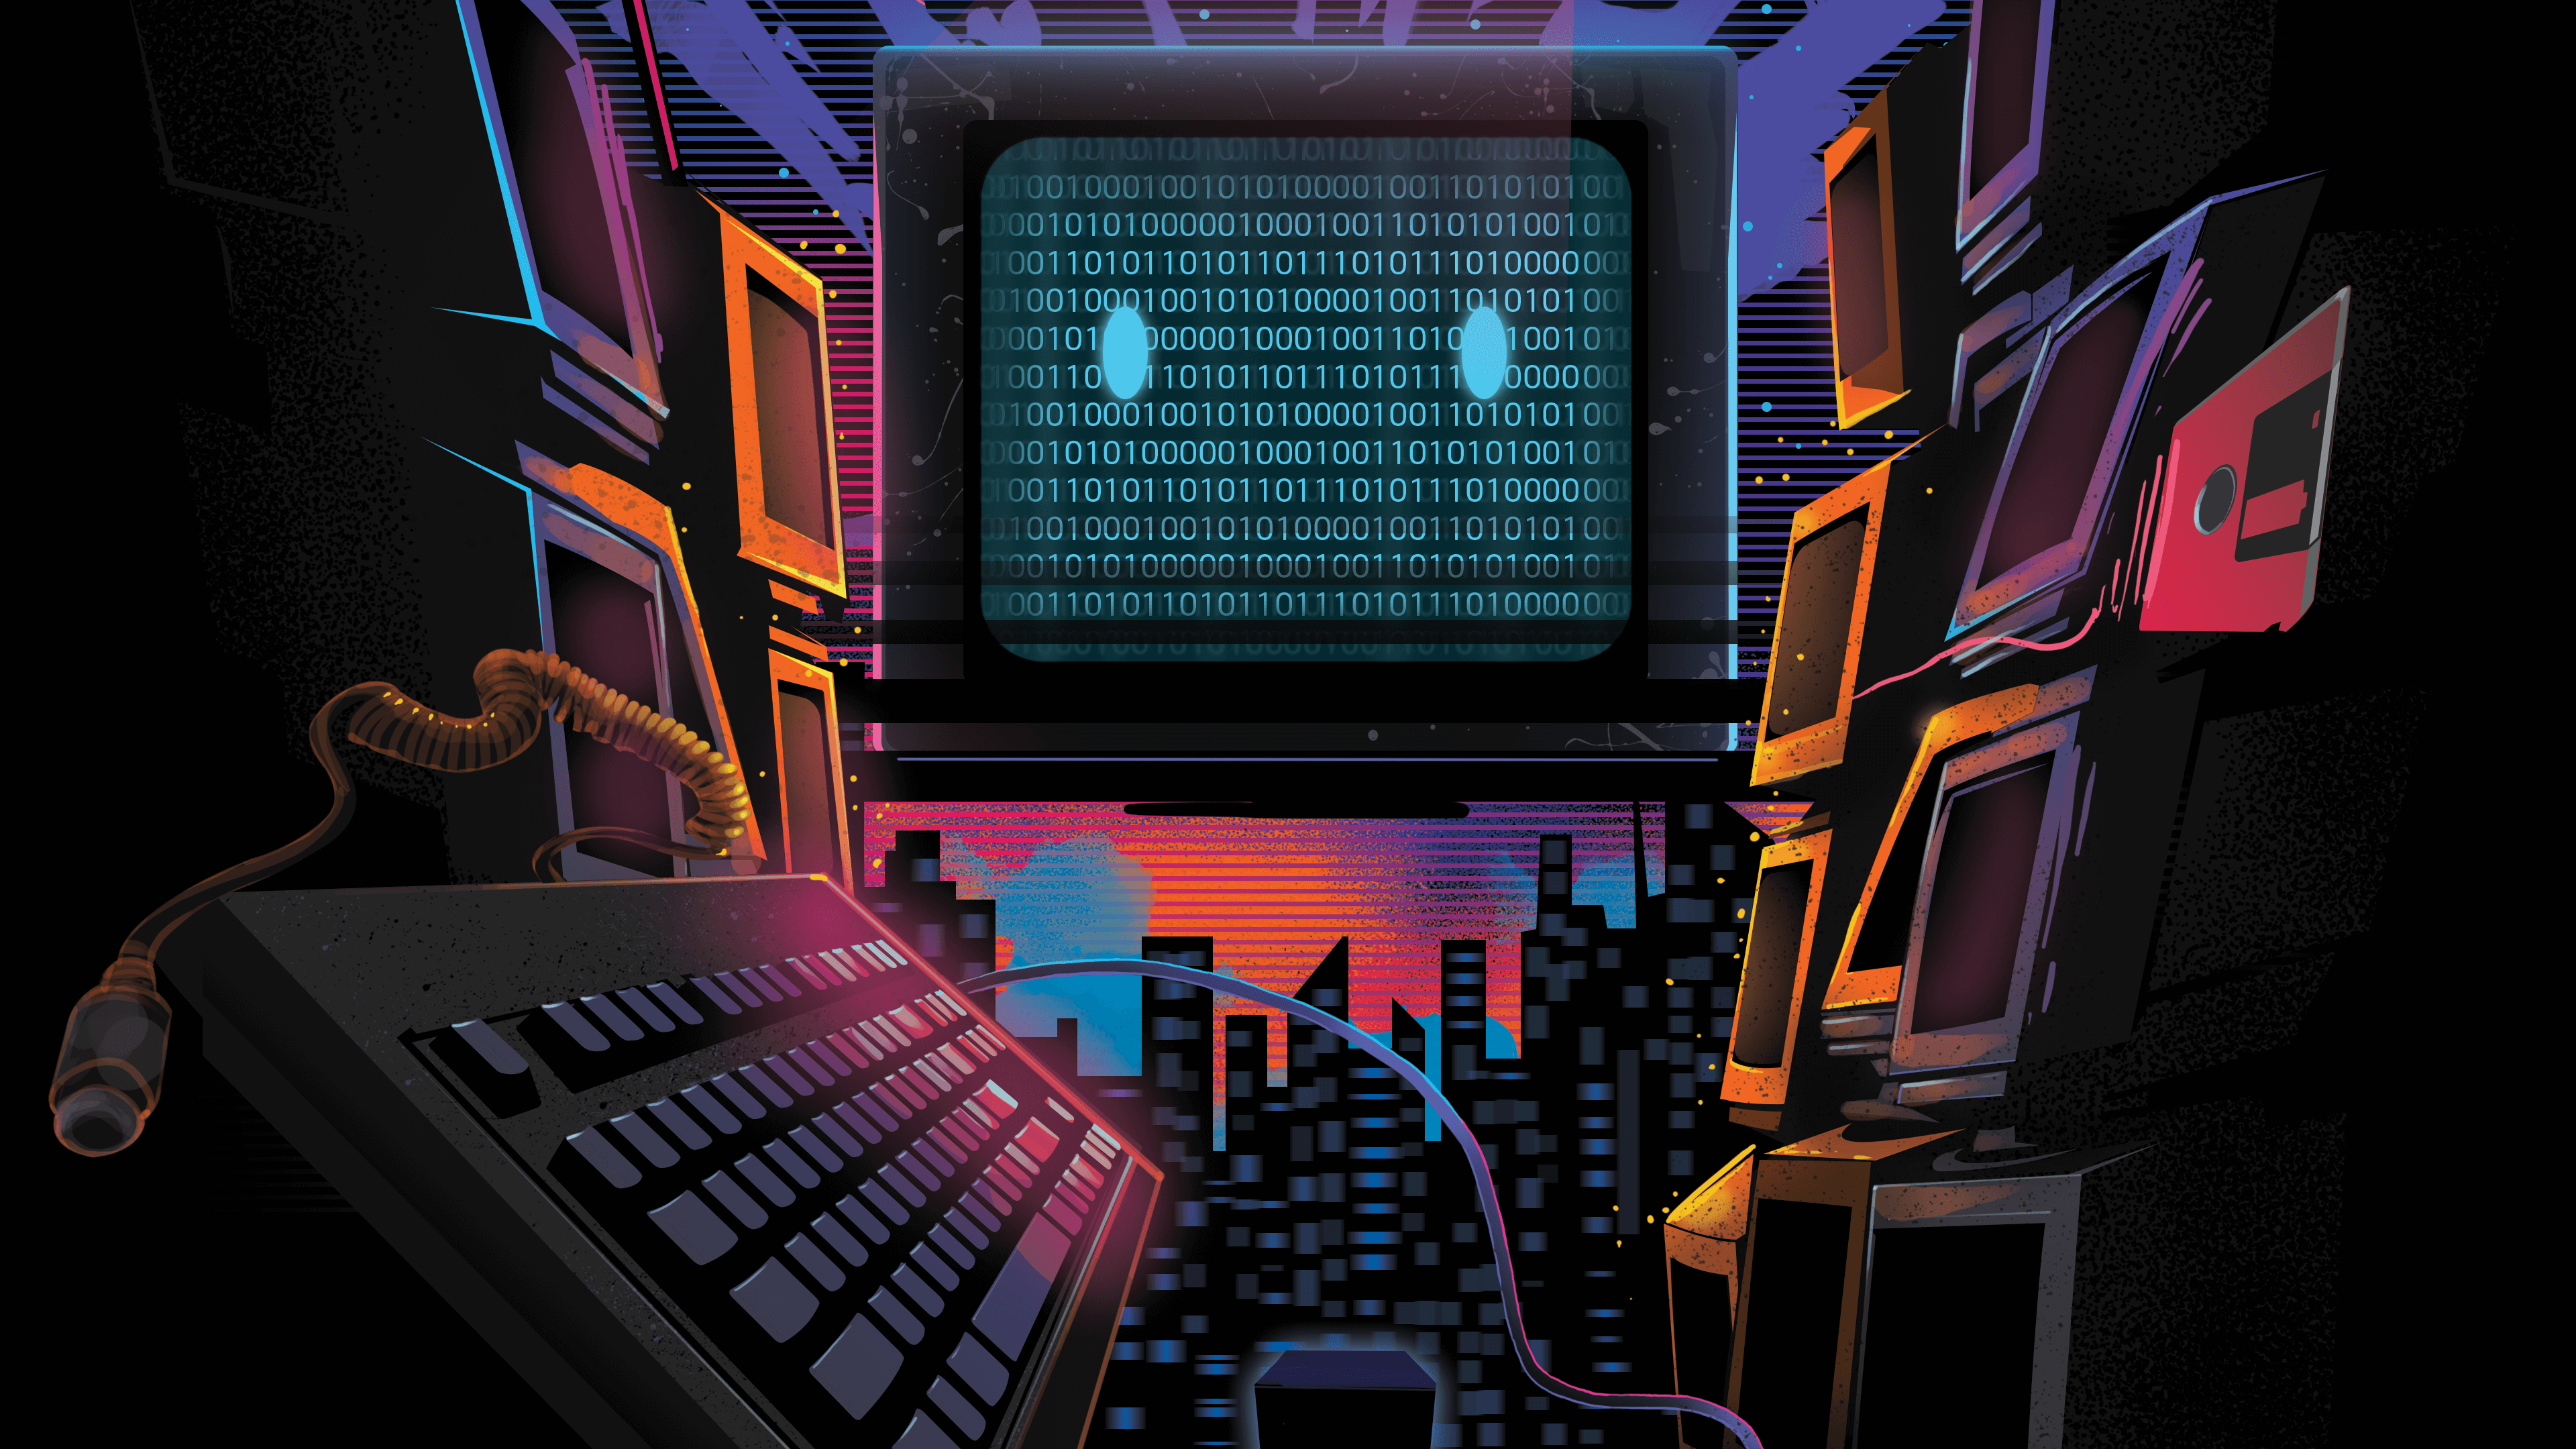 retro abstract computers wallpaper 64259